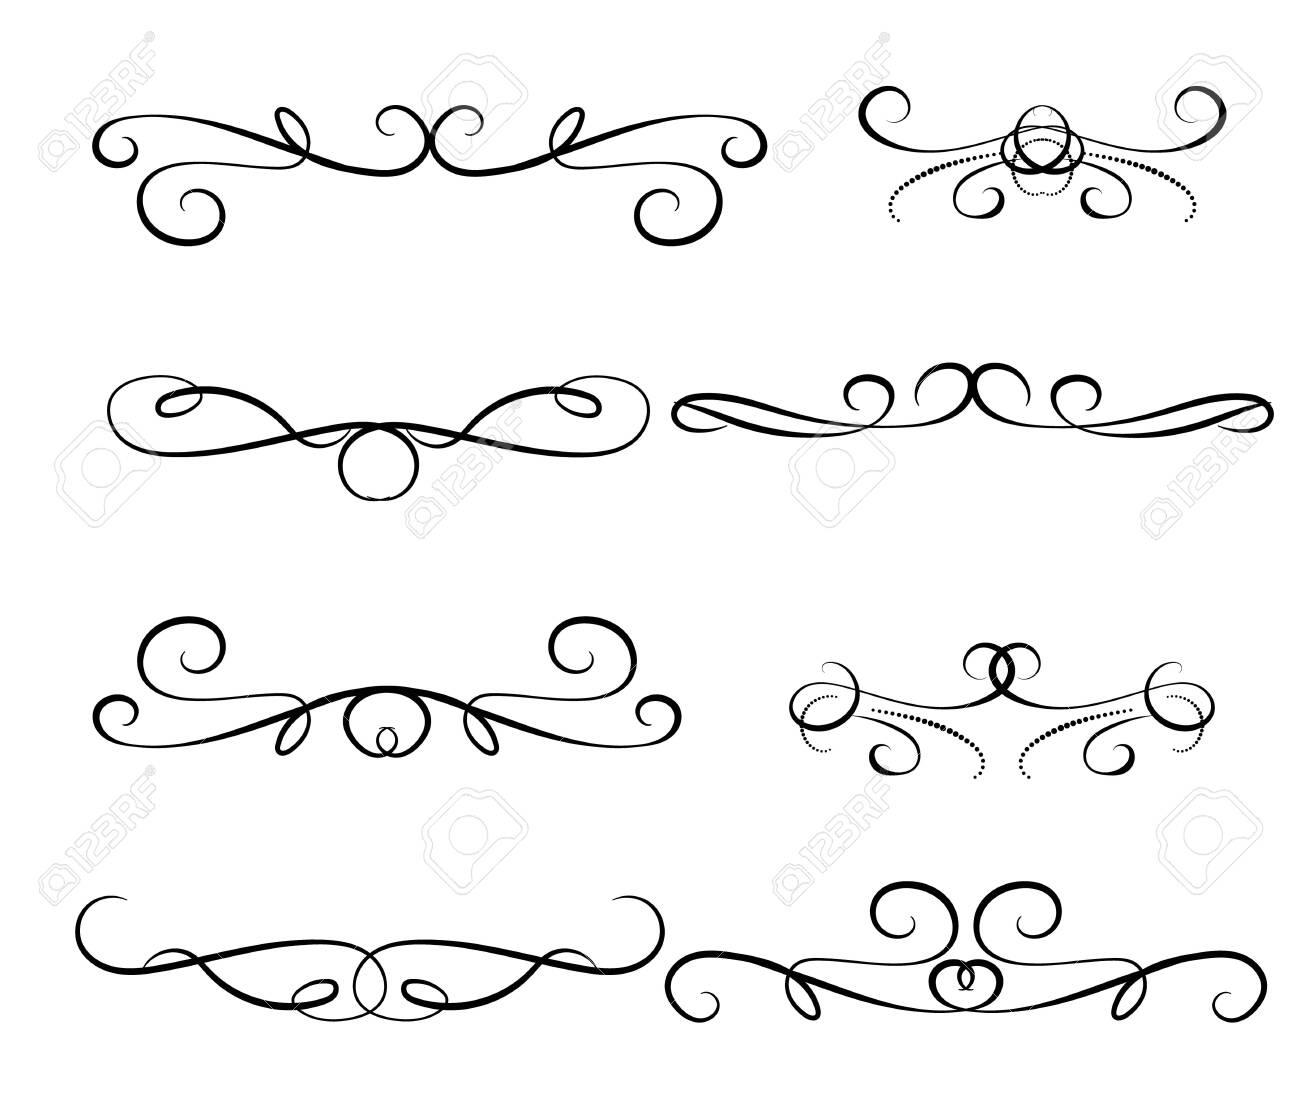 Set of decorative florish dividers borders - 124407038